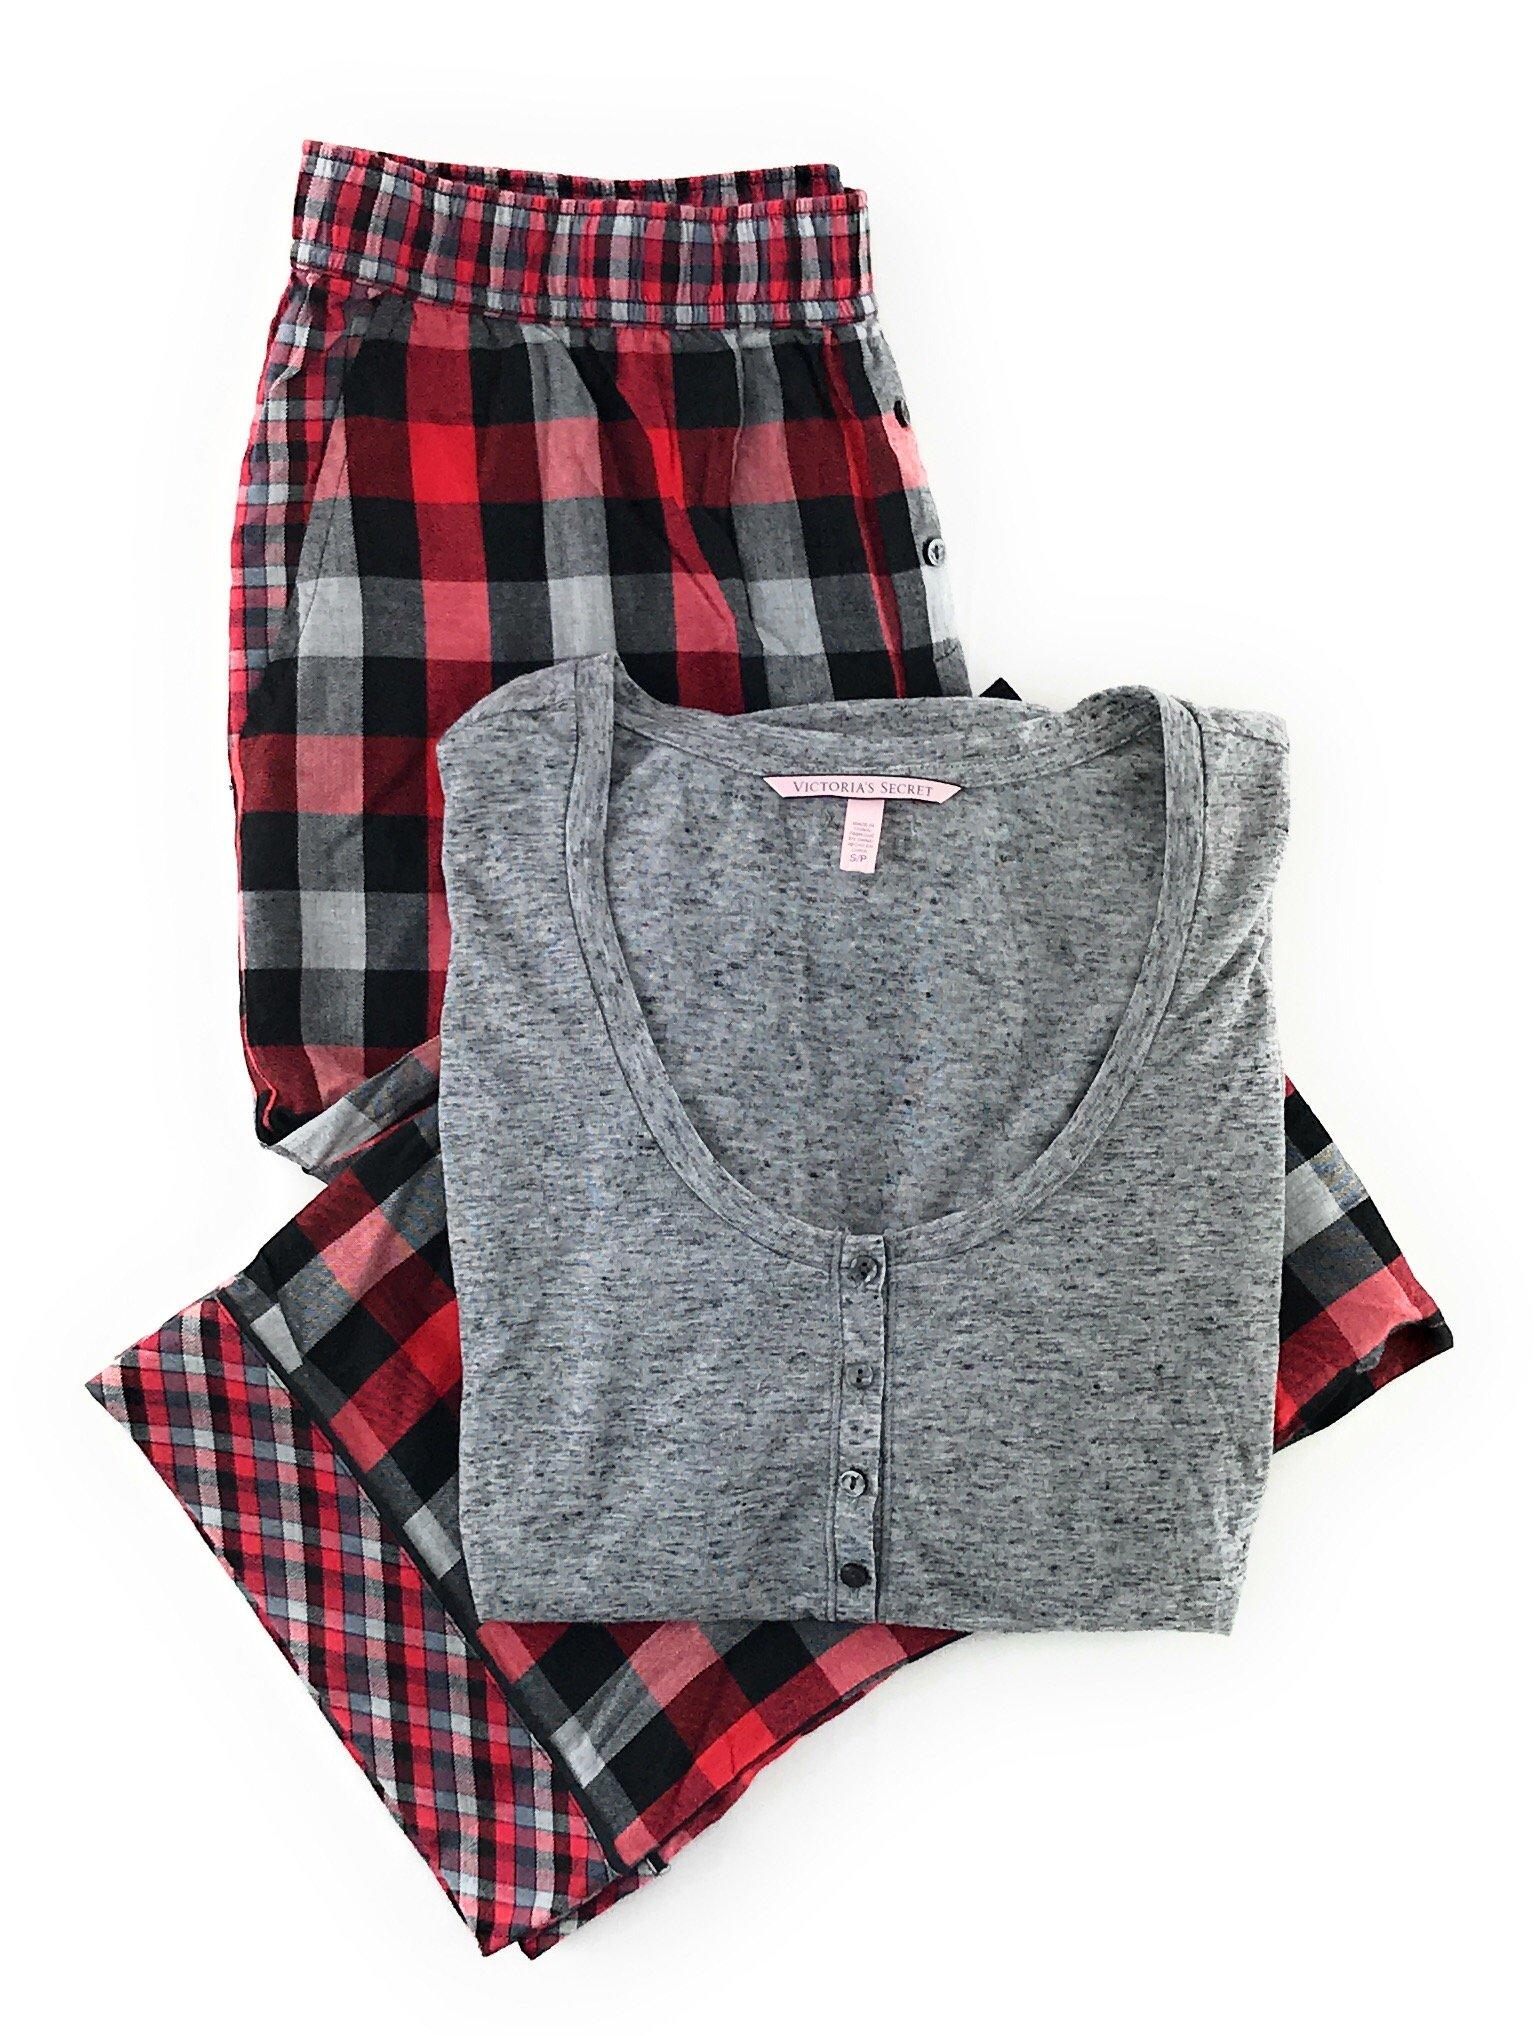 Victoria's Secret Dreamer Henley Pajama Set Light Gray/Red Black Gray Plaid Medium by Victoria's Secret (Image #1)